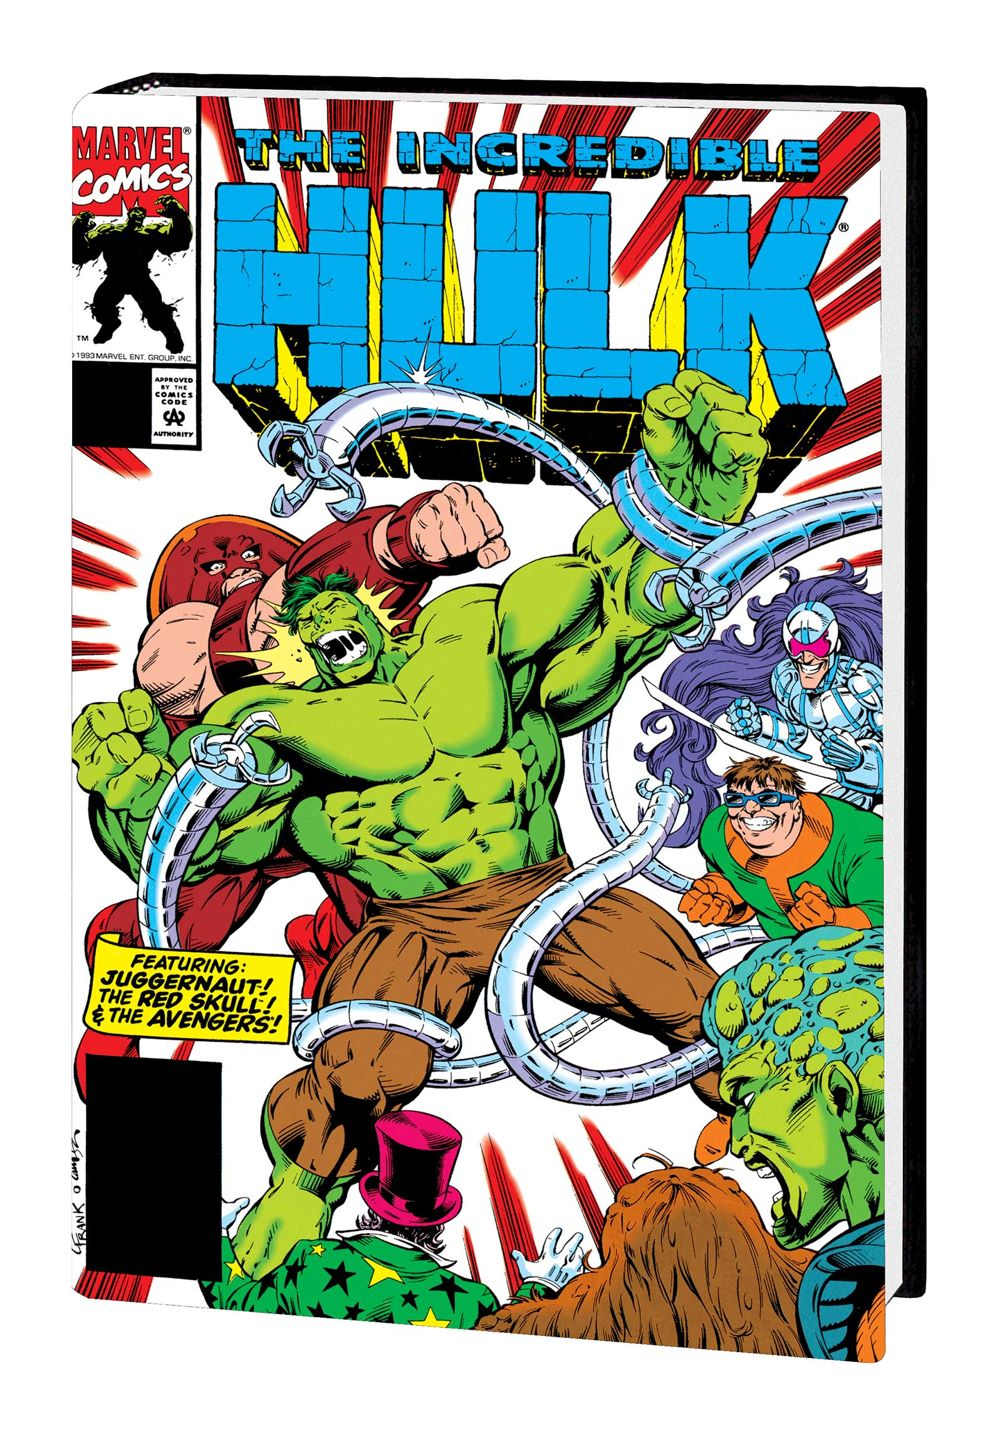 HULK_VOL_3_OMNIBUS_HC_DAVID_VAR Marvel Comics January 2021 Solicitations